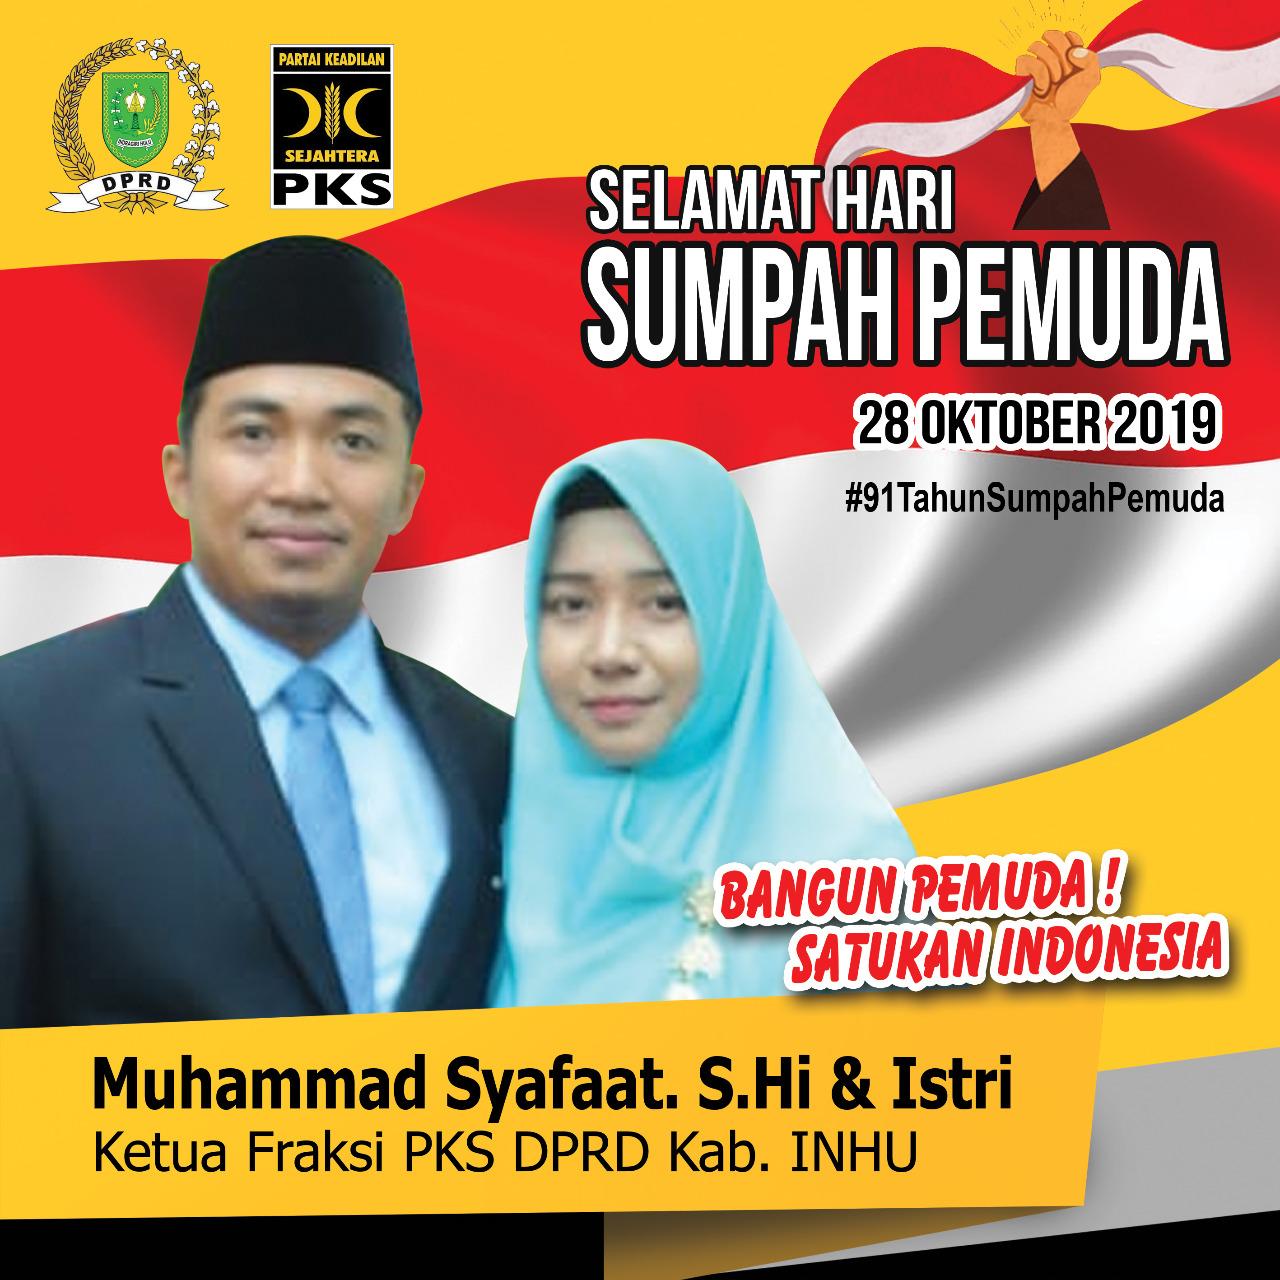 Ketua Fraksi PKS DPRD Inhu